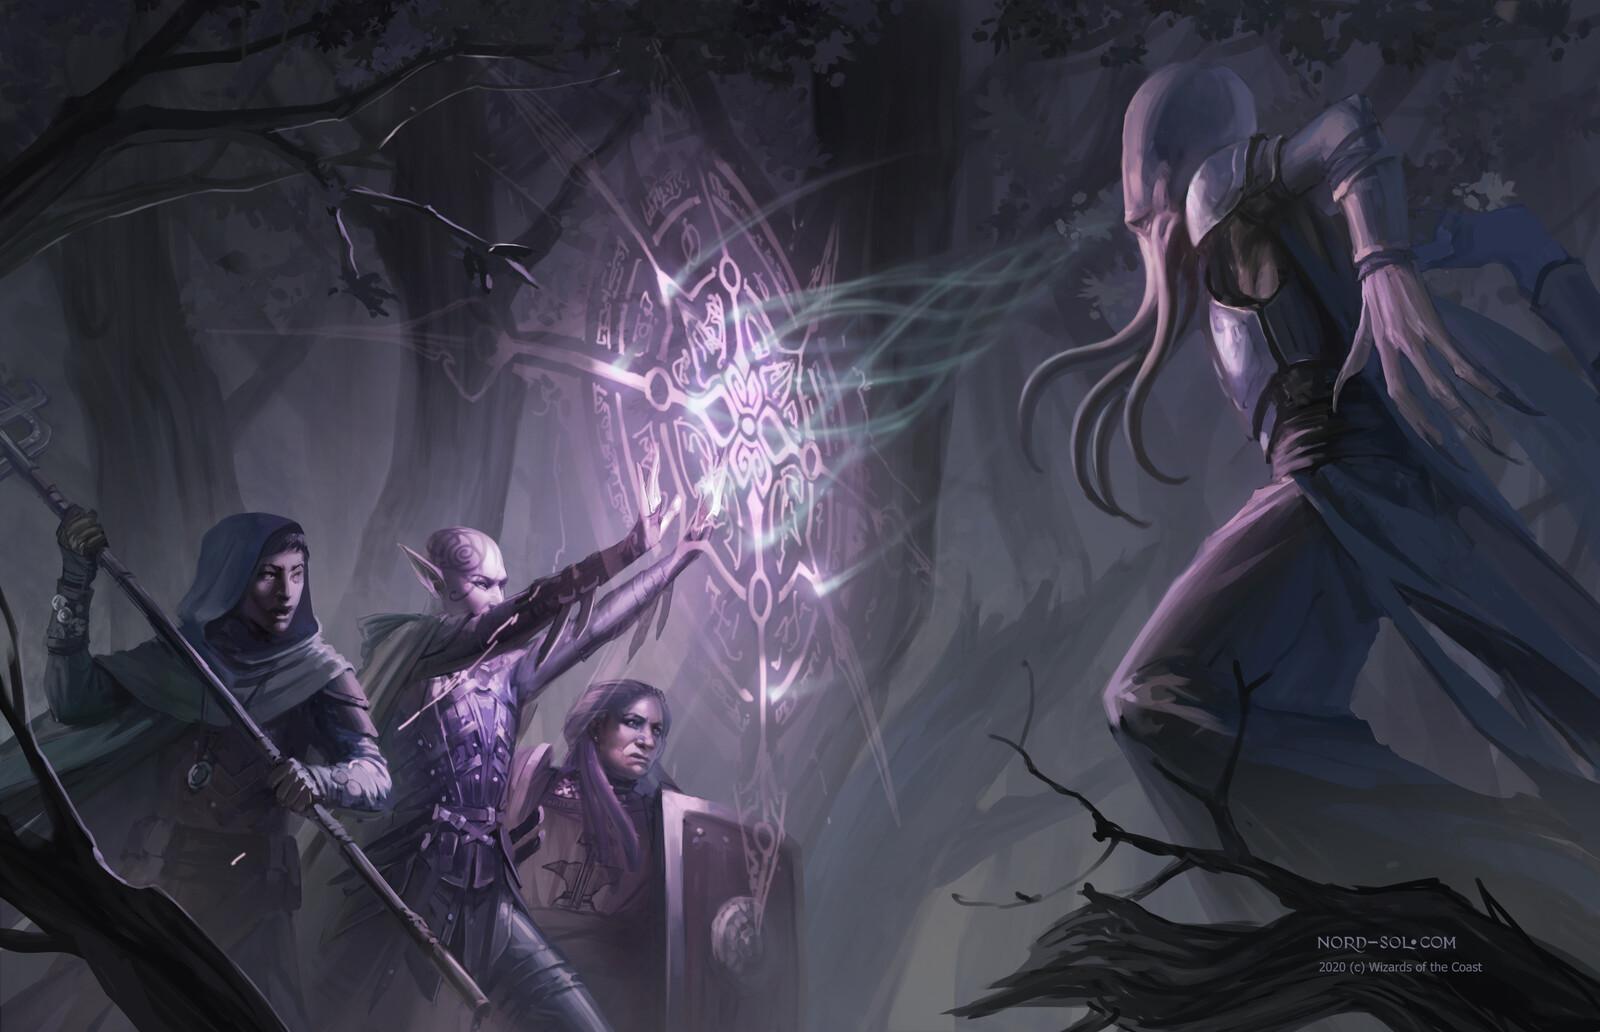 Artworks for D&D Tasha's Cauldron of Everything